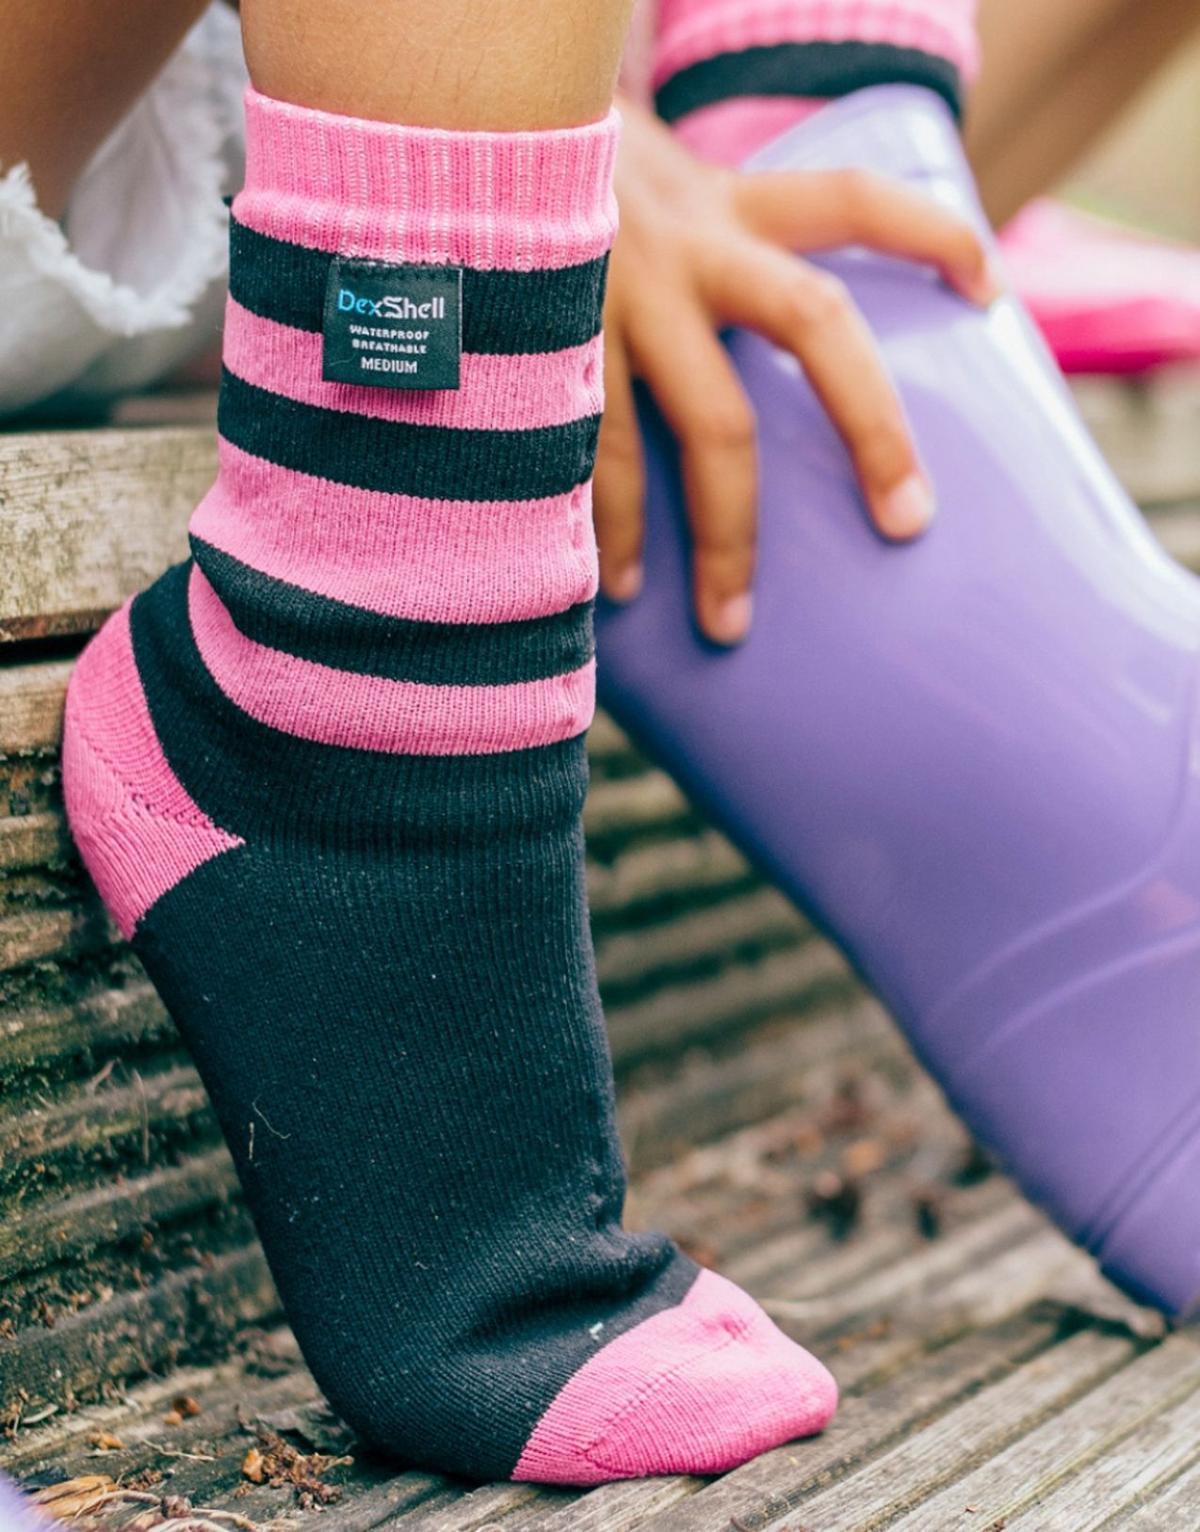 Gear and Gadgets: DexShell Waterproof Socks | Travel | richmond com